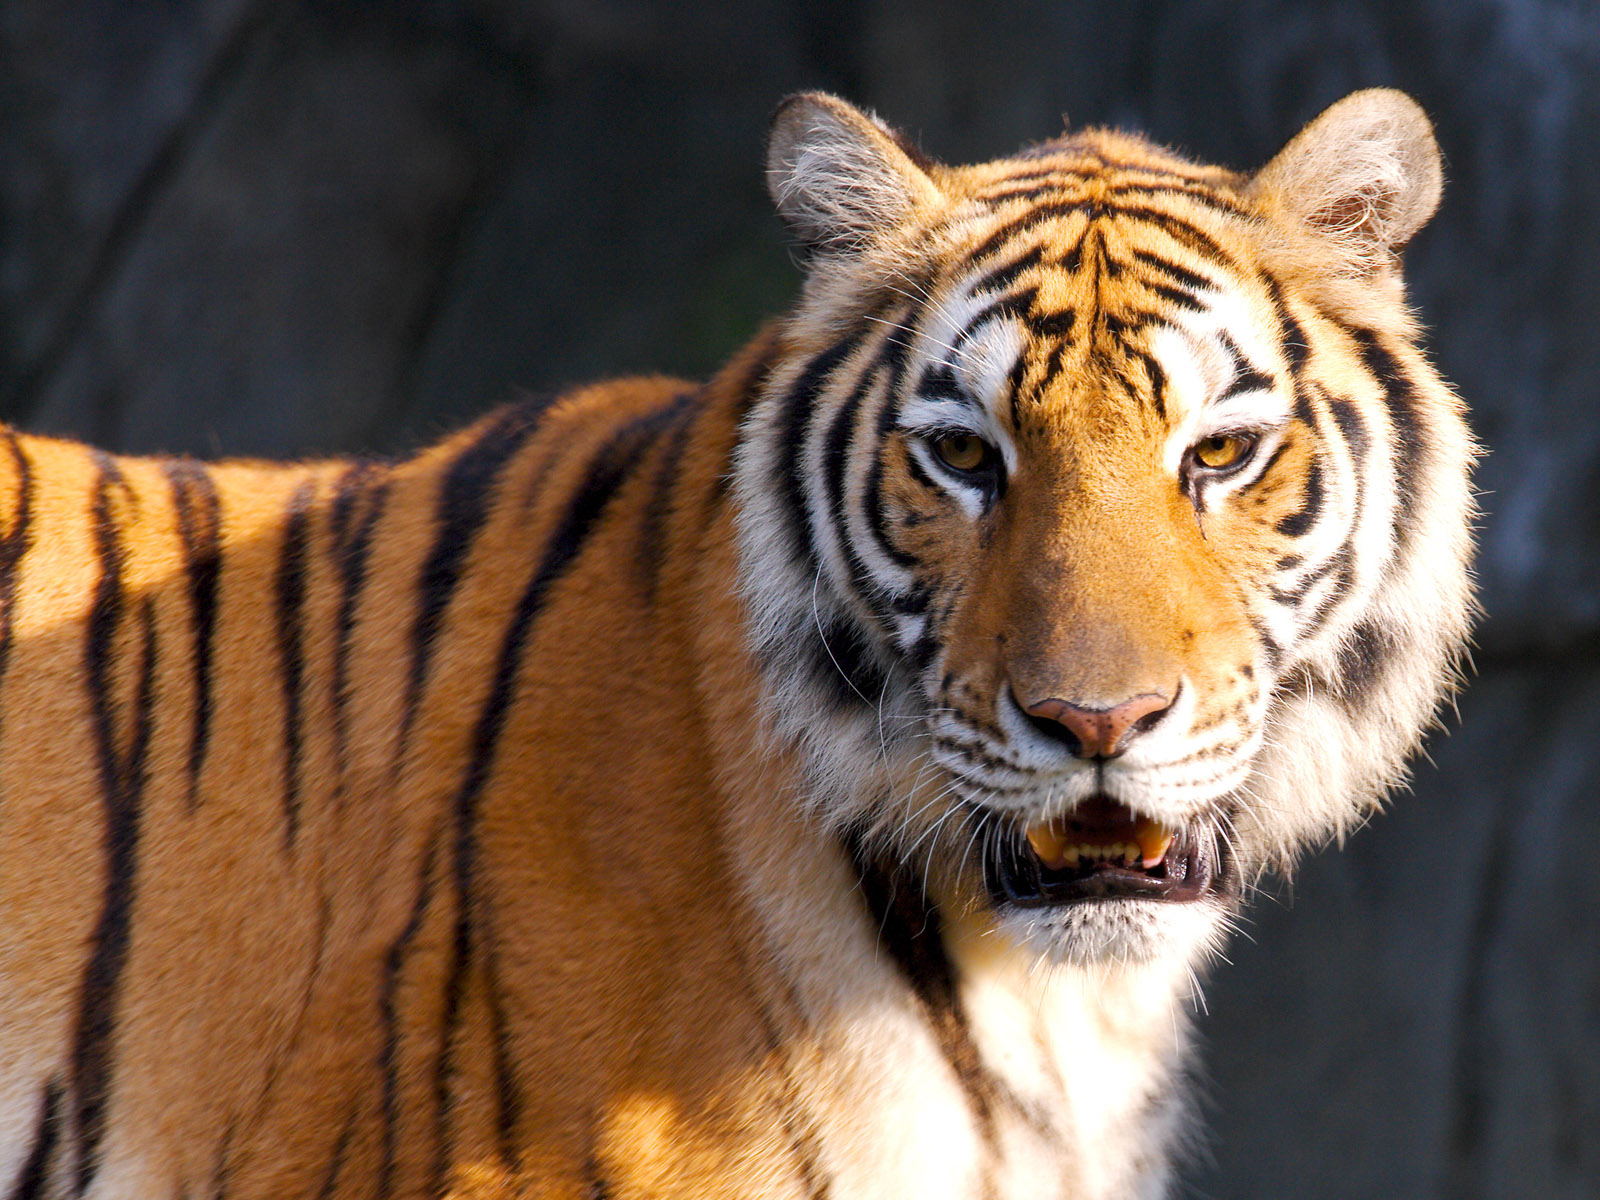 Shivaji Maharaj Hd Wallpaper For Pc Tiger Hd Wallpapers Wallpapers Hd